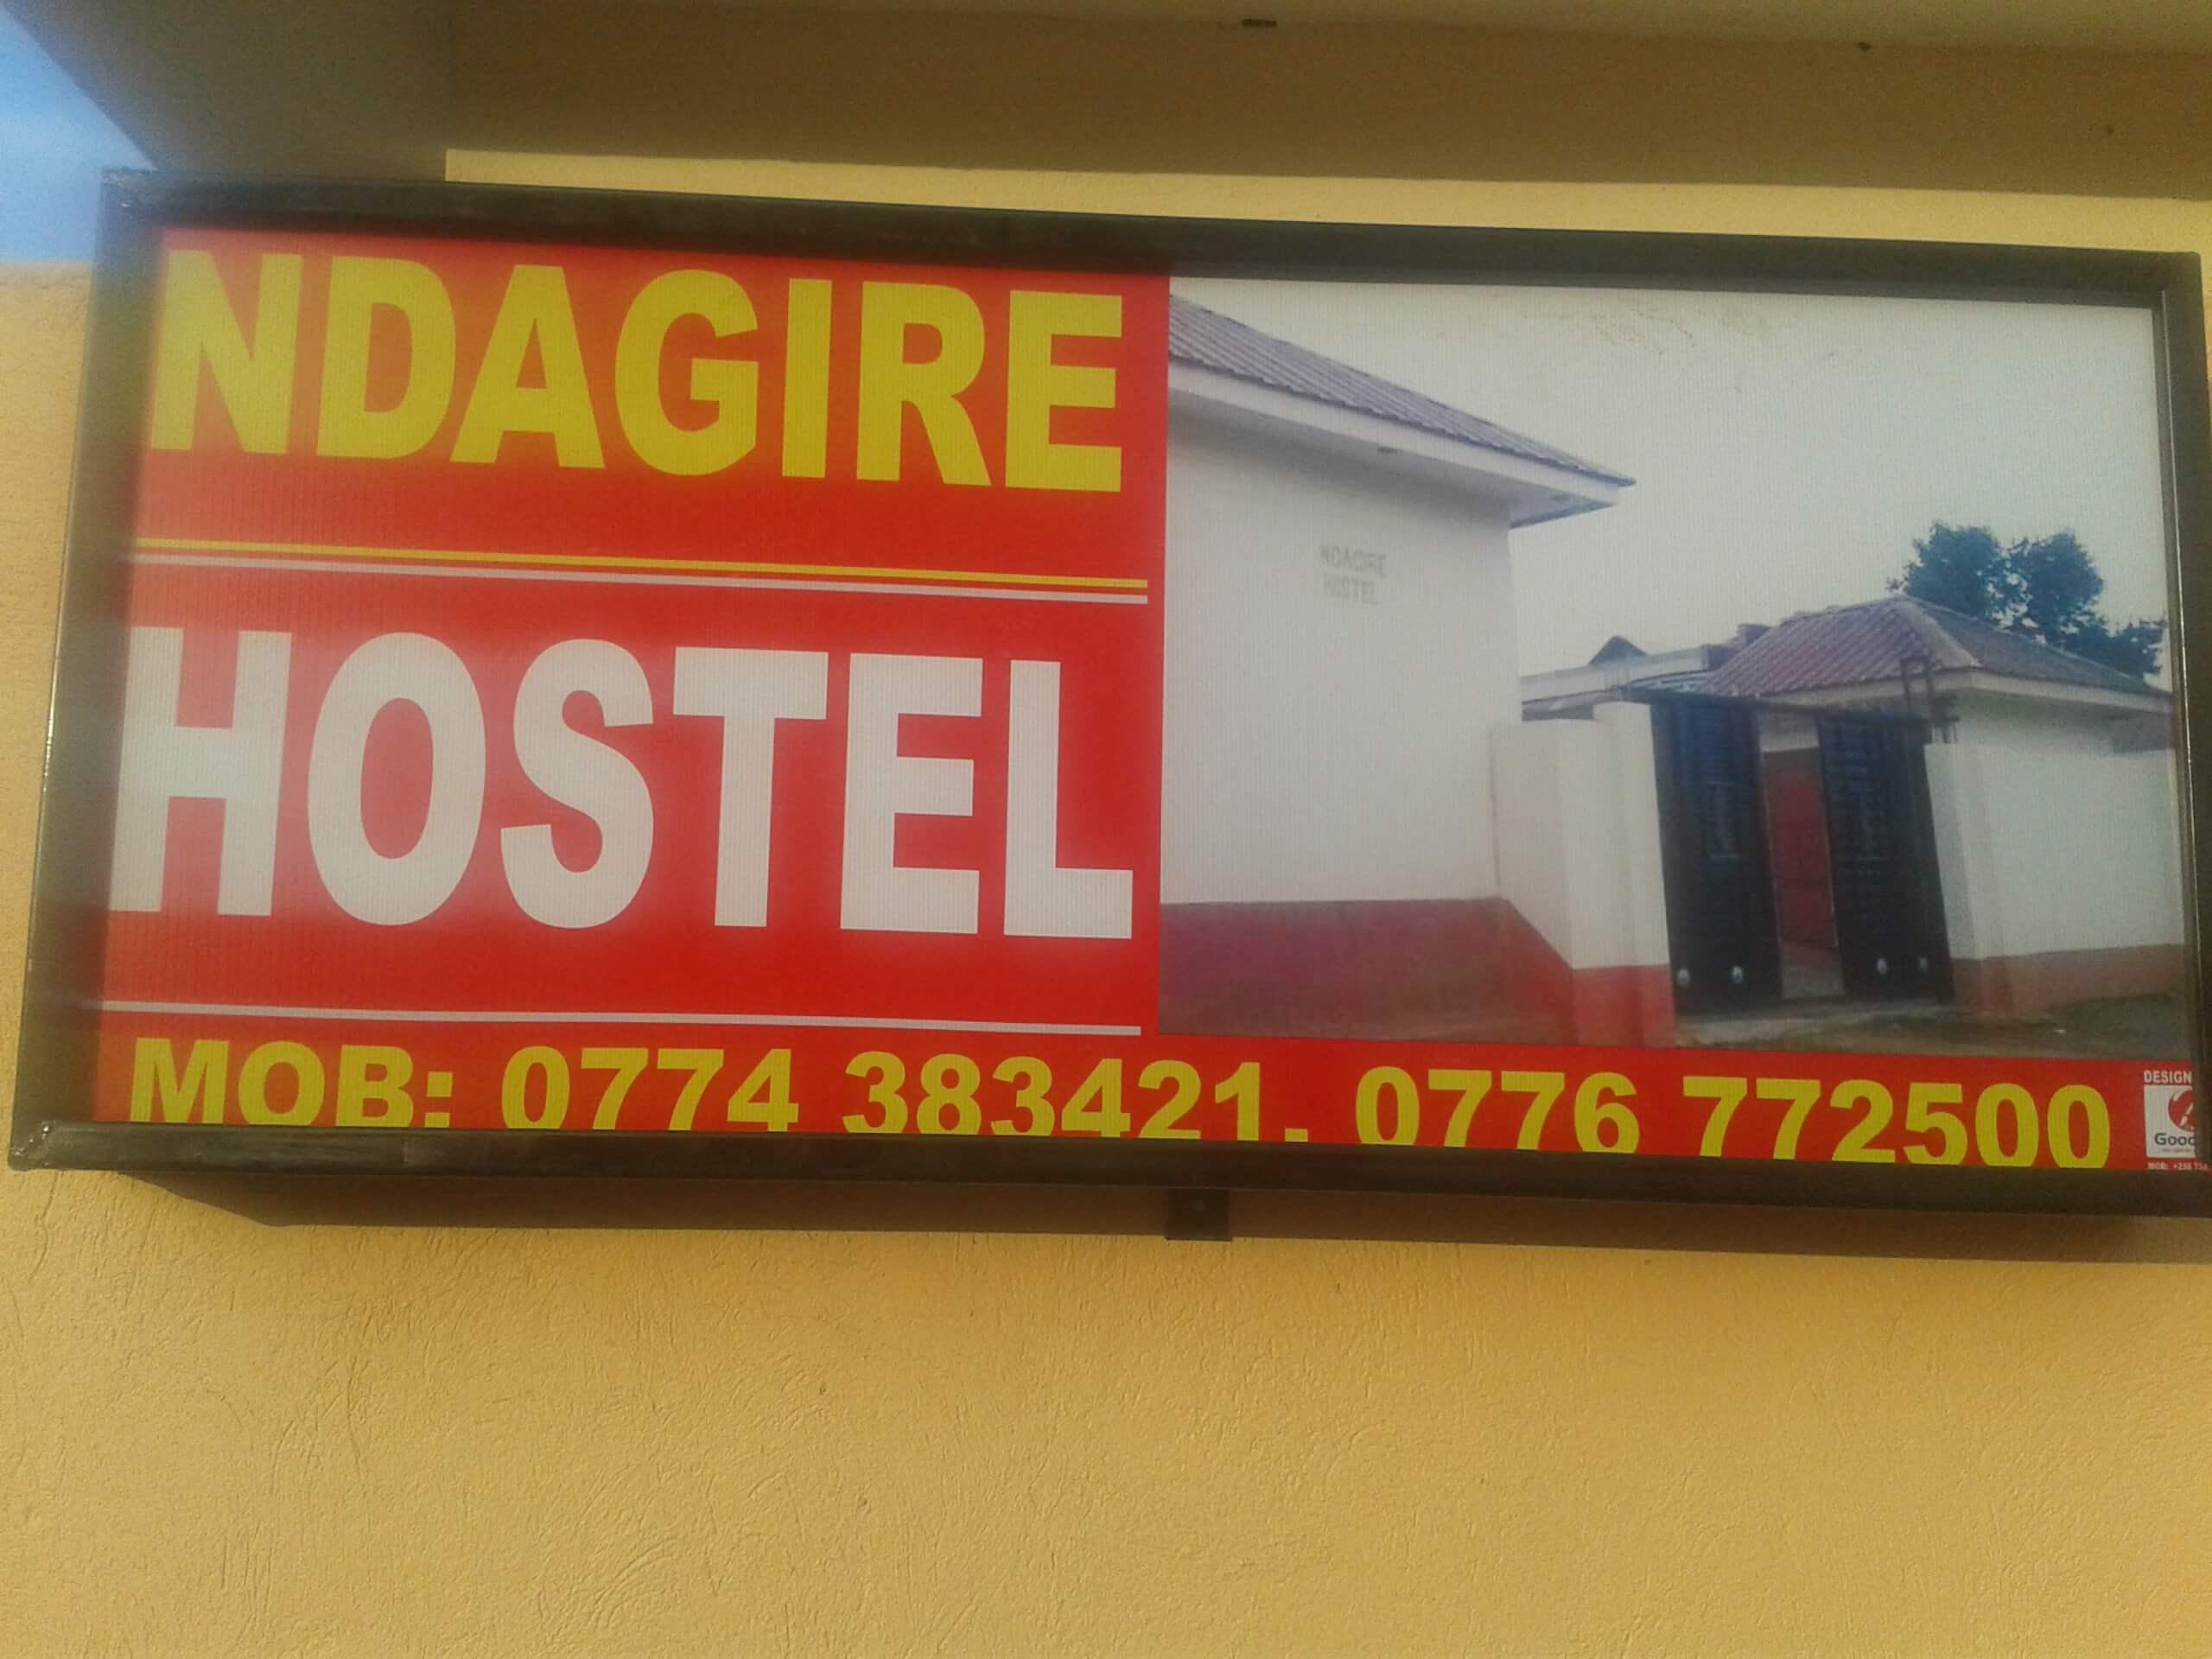 Ndagire Hostel